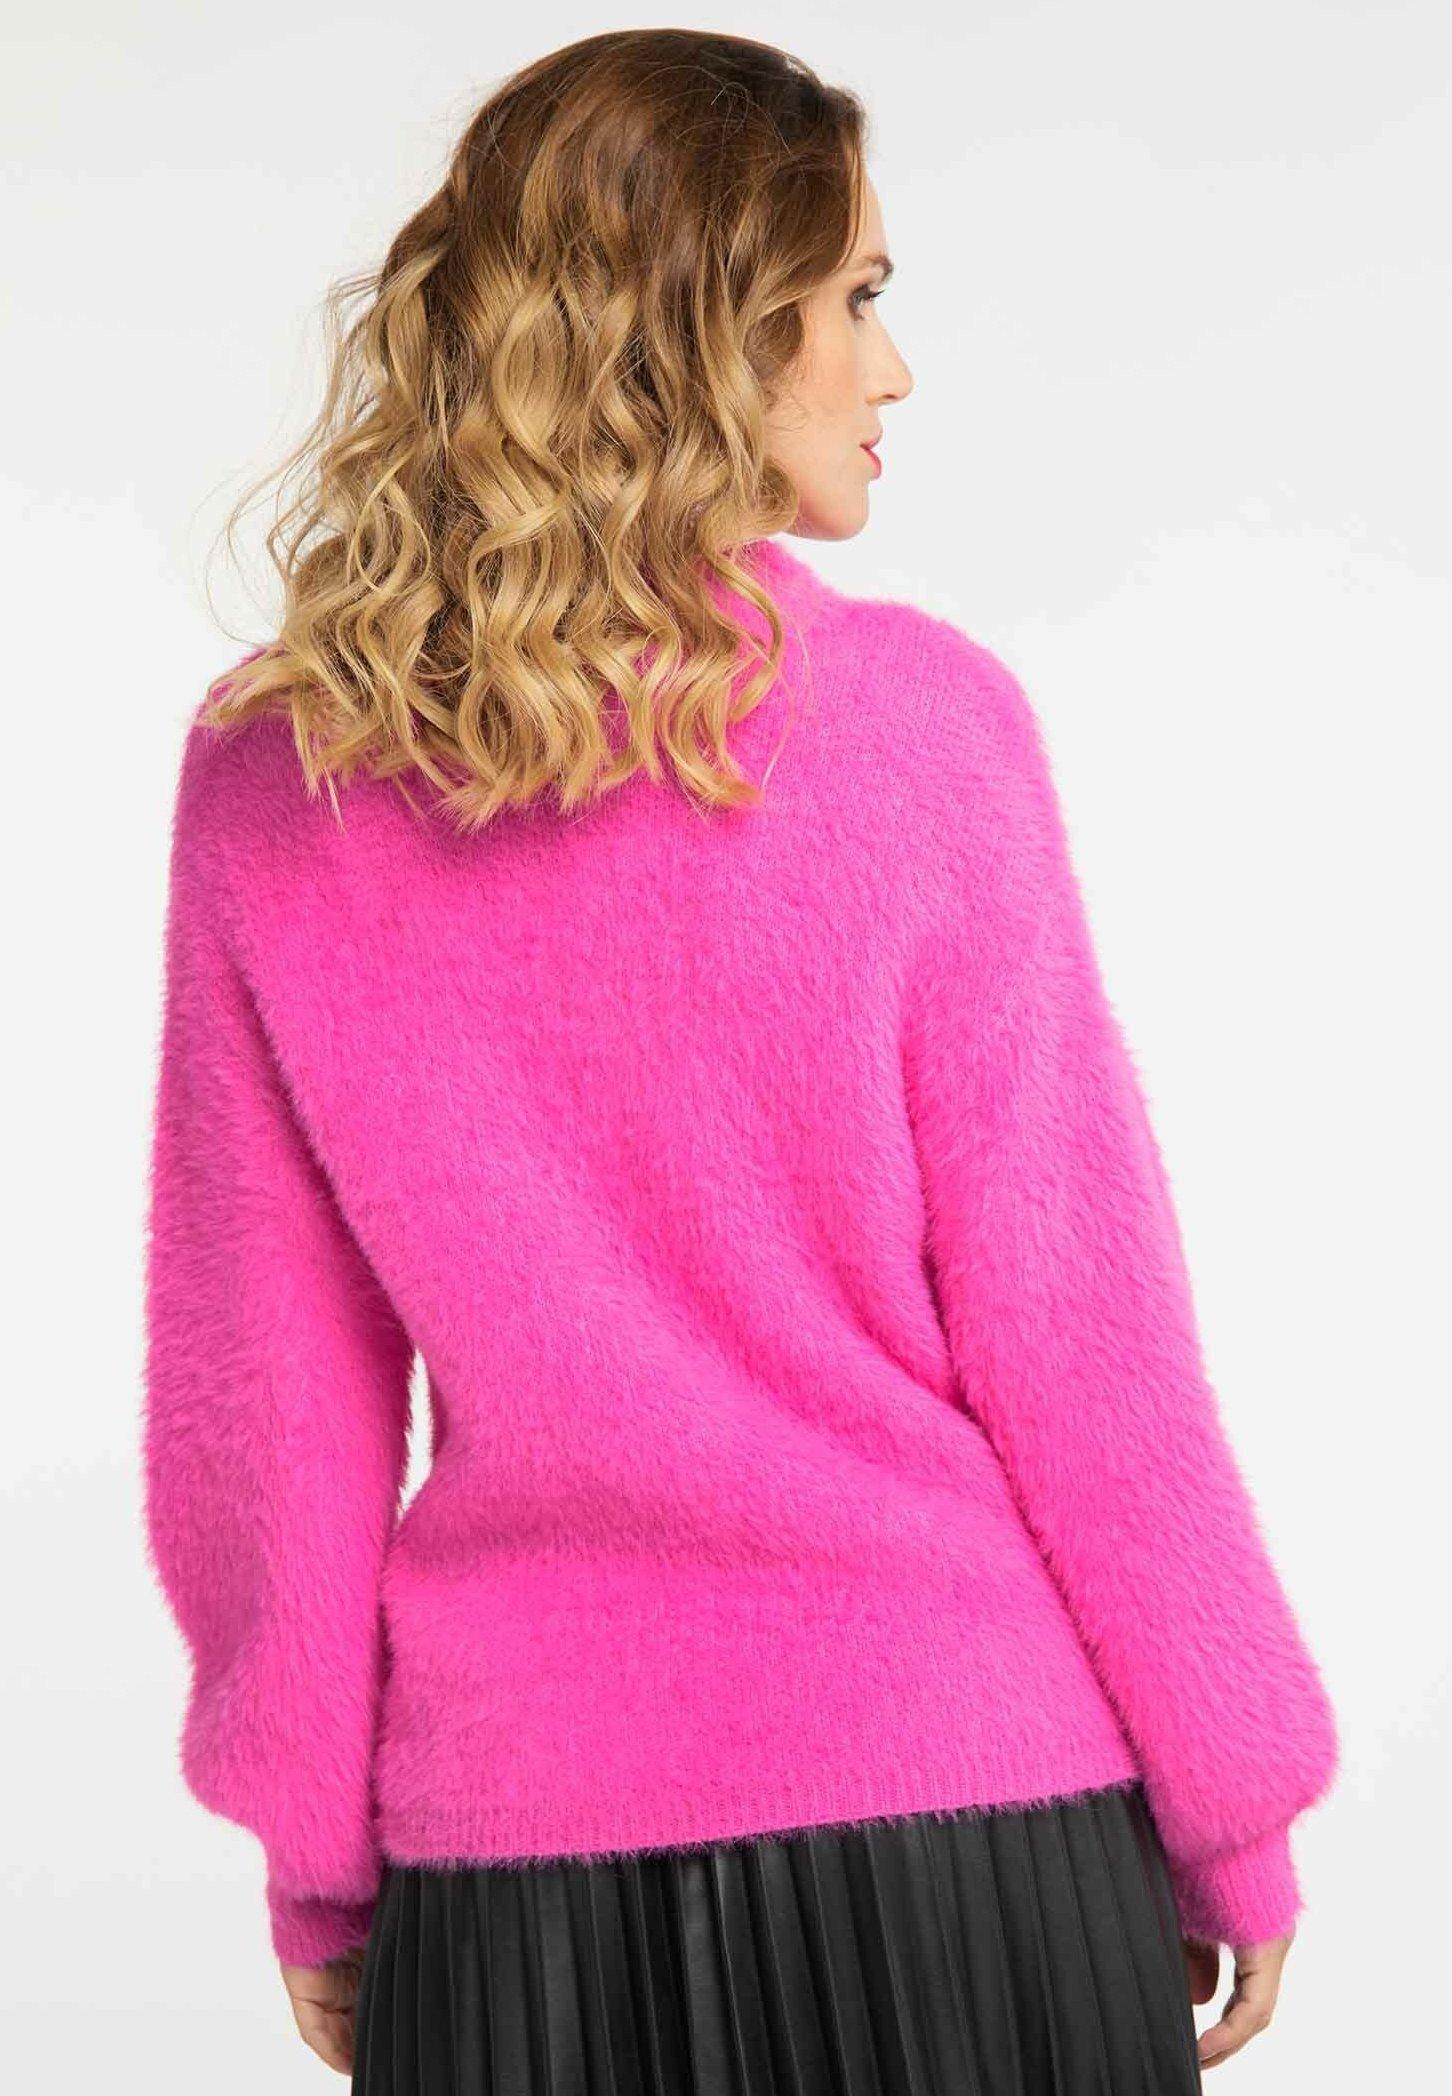 Very Cheap Women's Clothing faina Jumper pink Us9GyVUBr